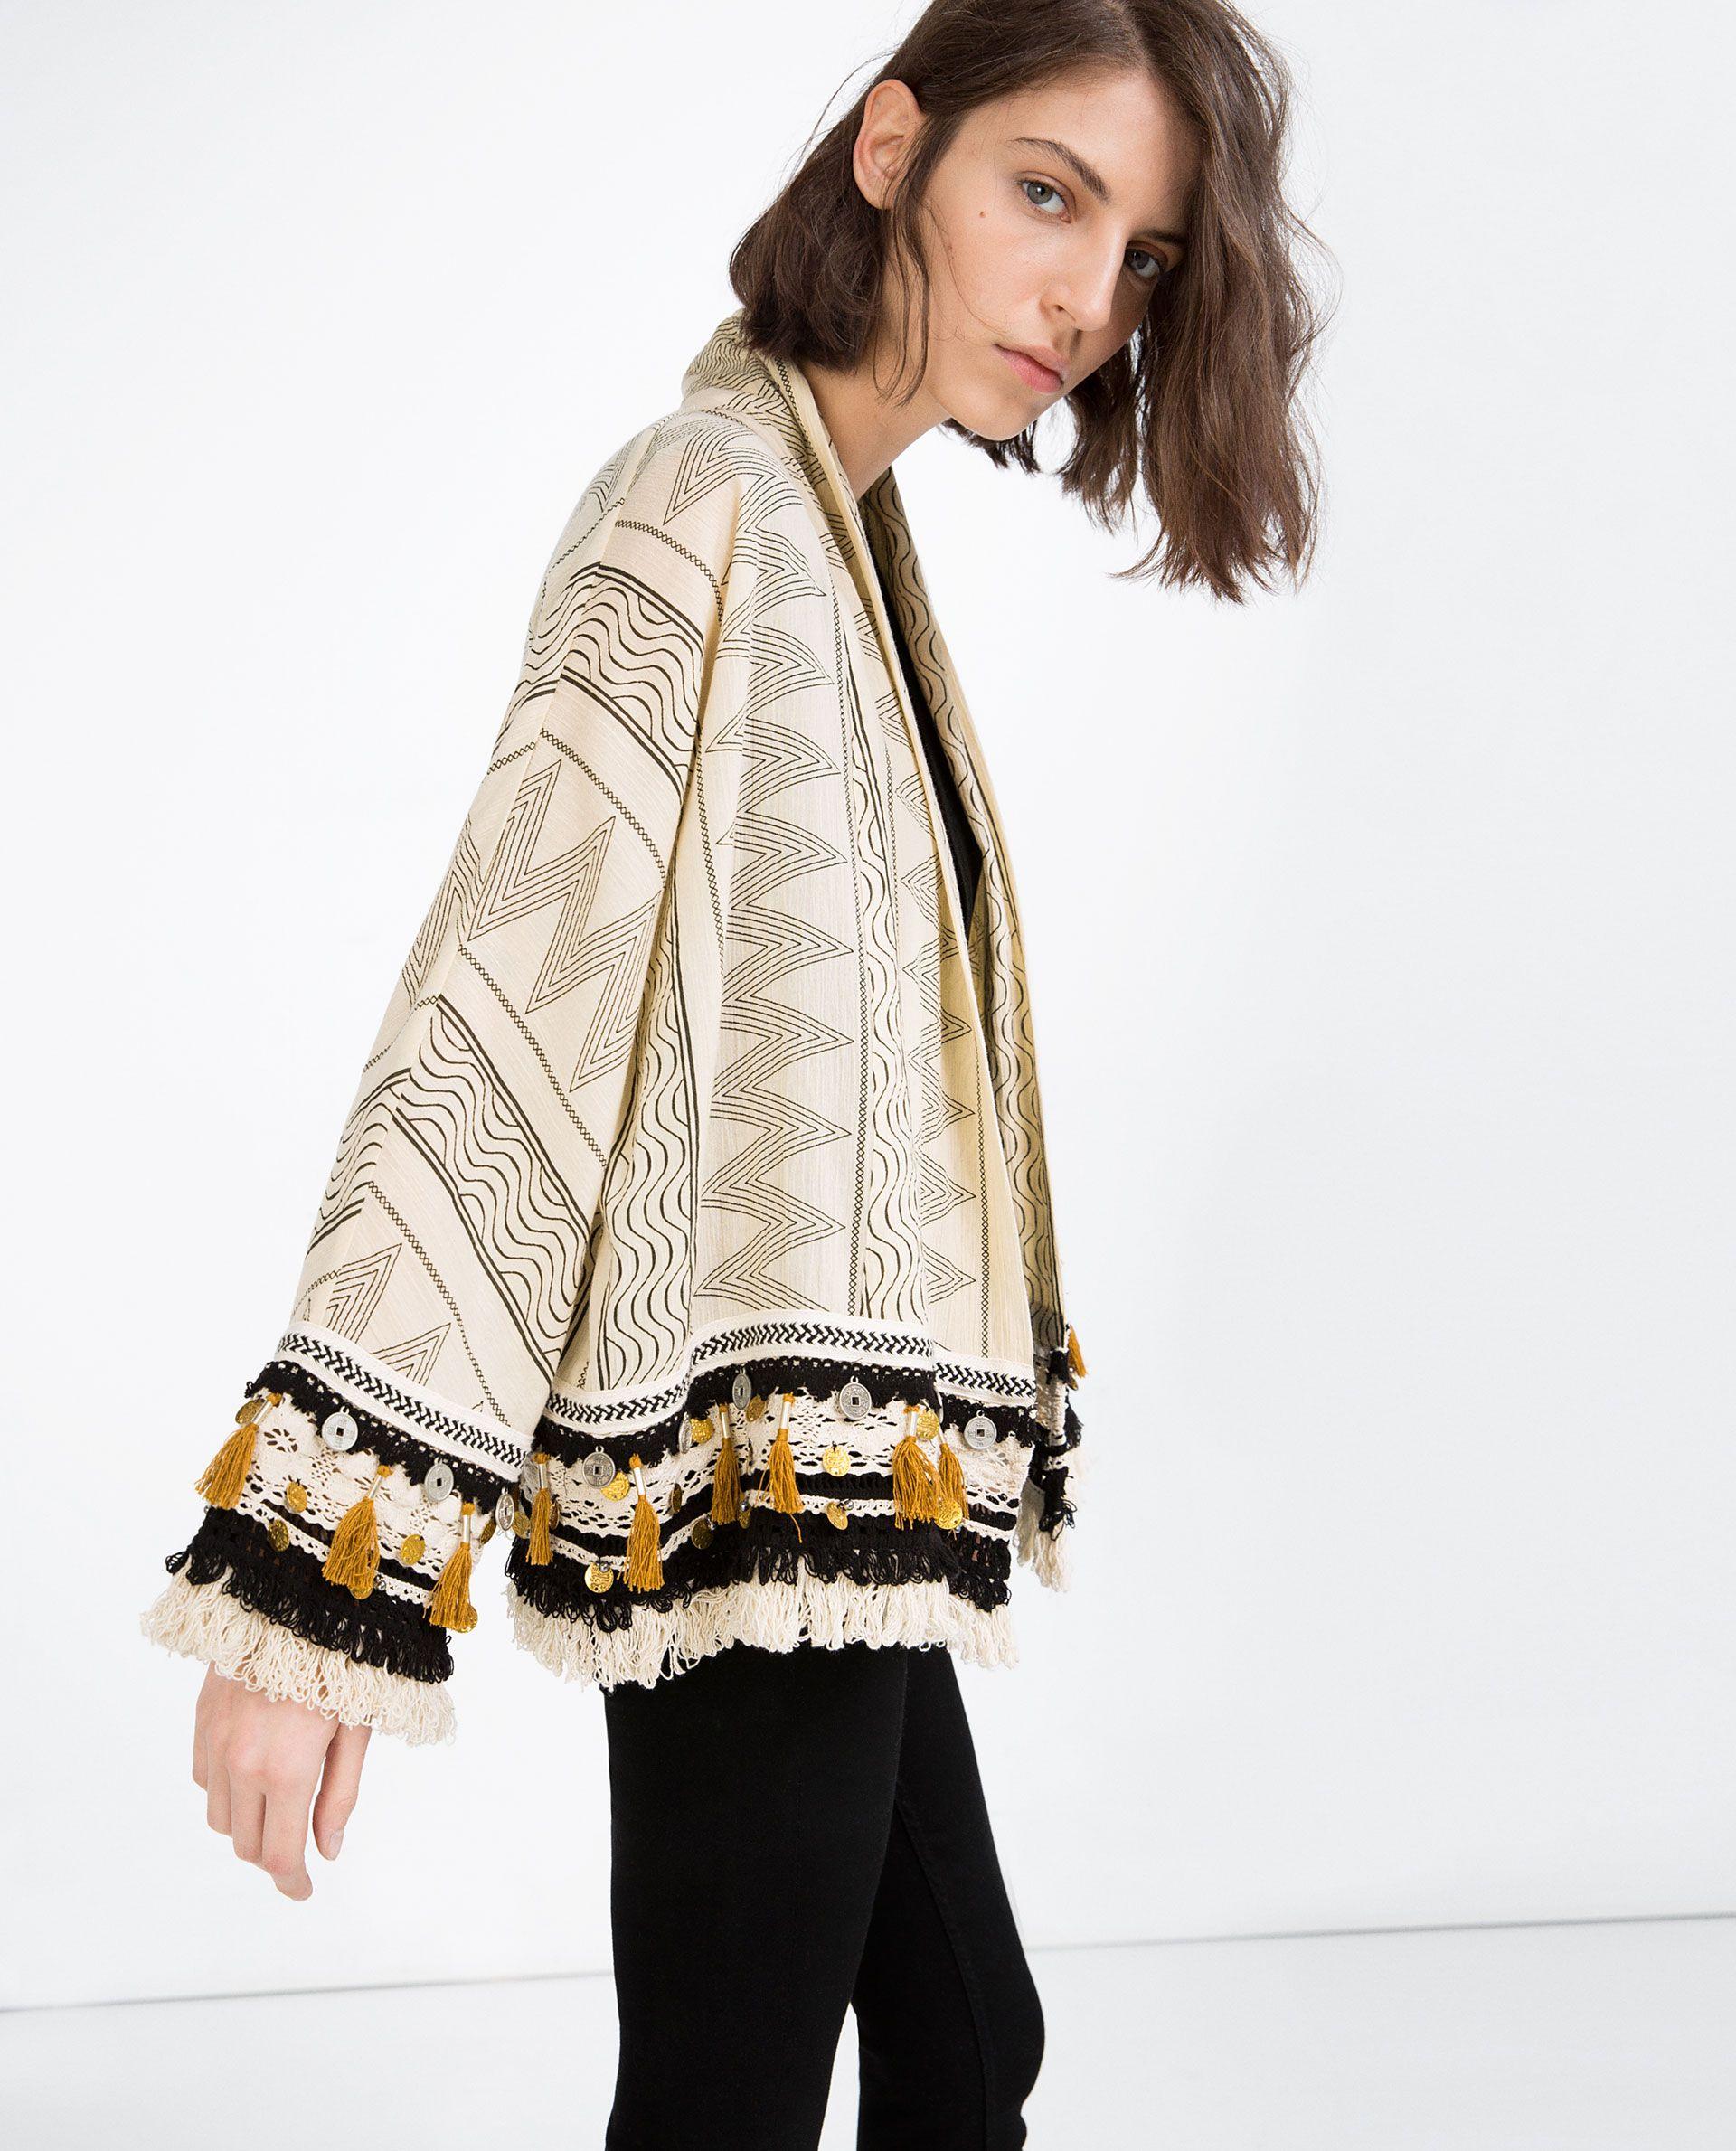 Zara Style Vêtements Image 4 Kimono Folk Pinterest Of From qTBnPtY4 59e6de6f864